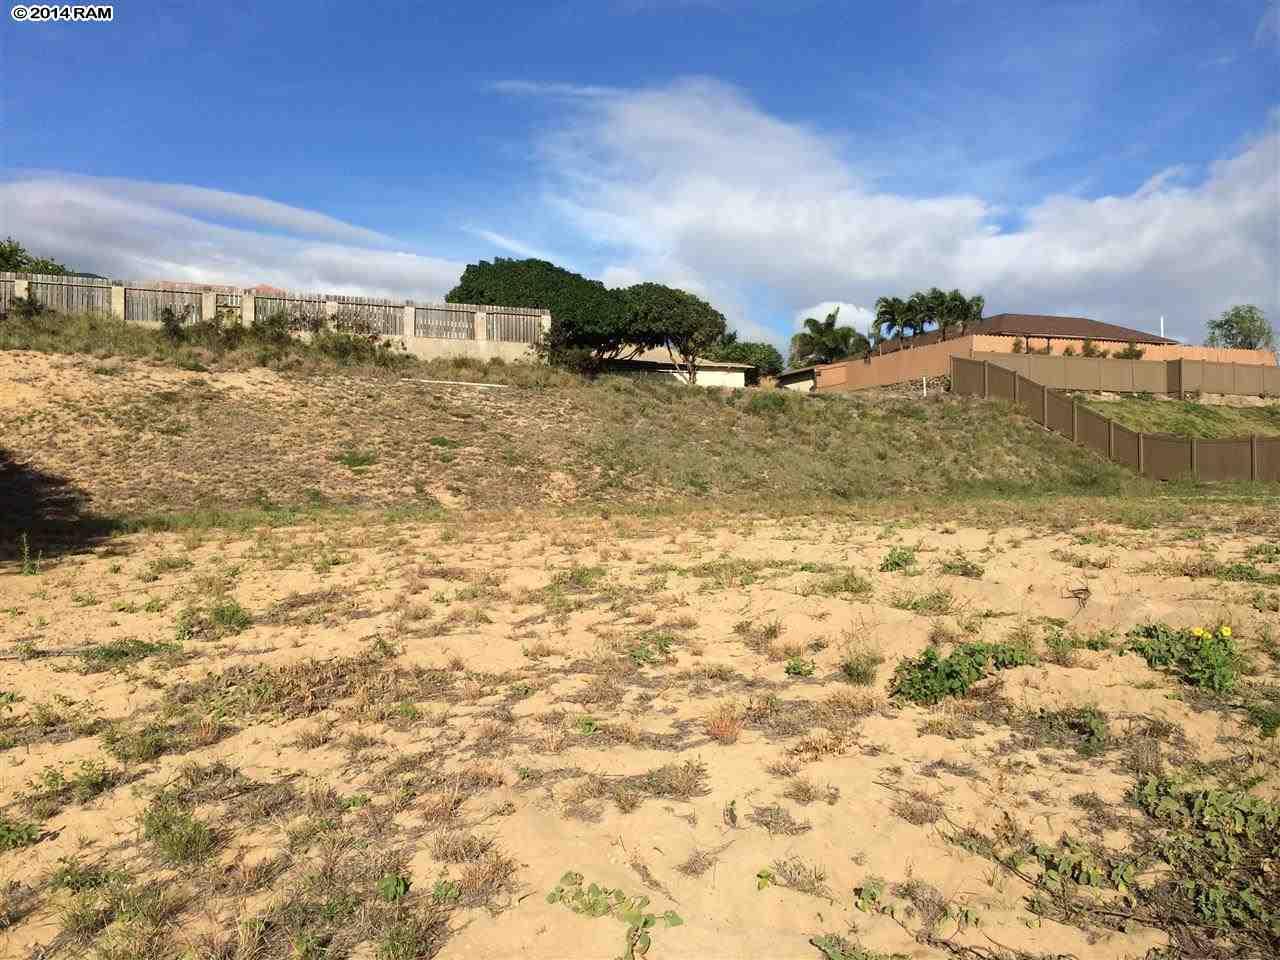 68 Keoneloa St Lot 31 Wailuku, Hi 96793 vacant land - photo 4 of 8